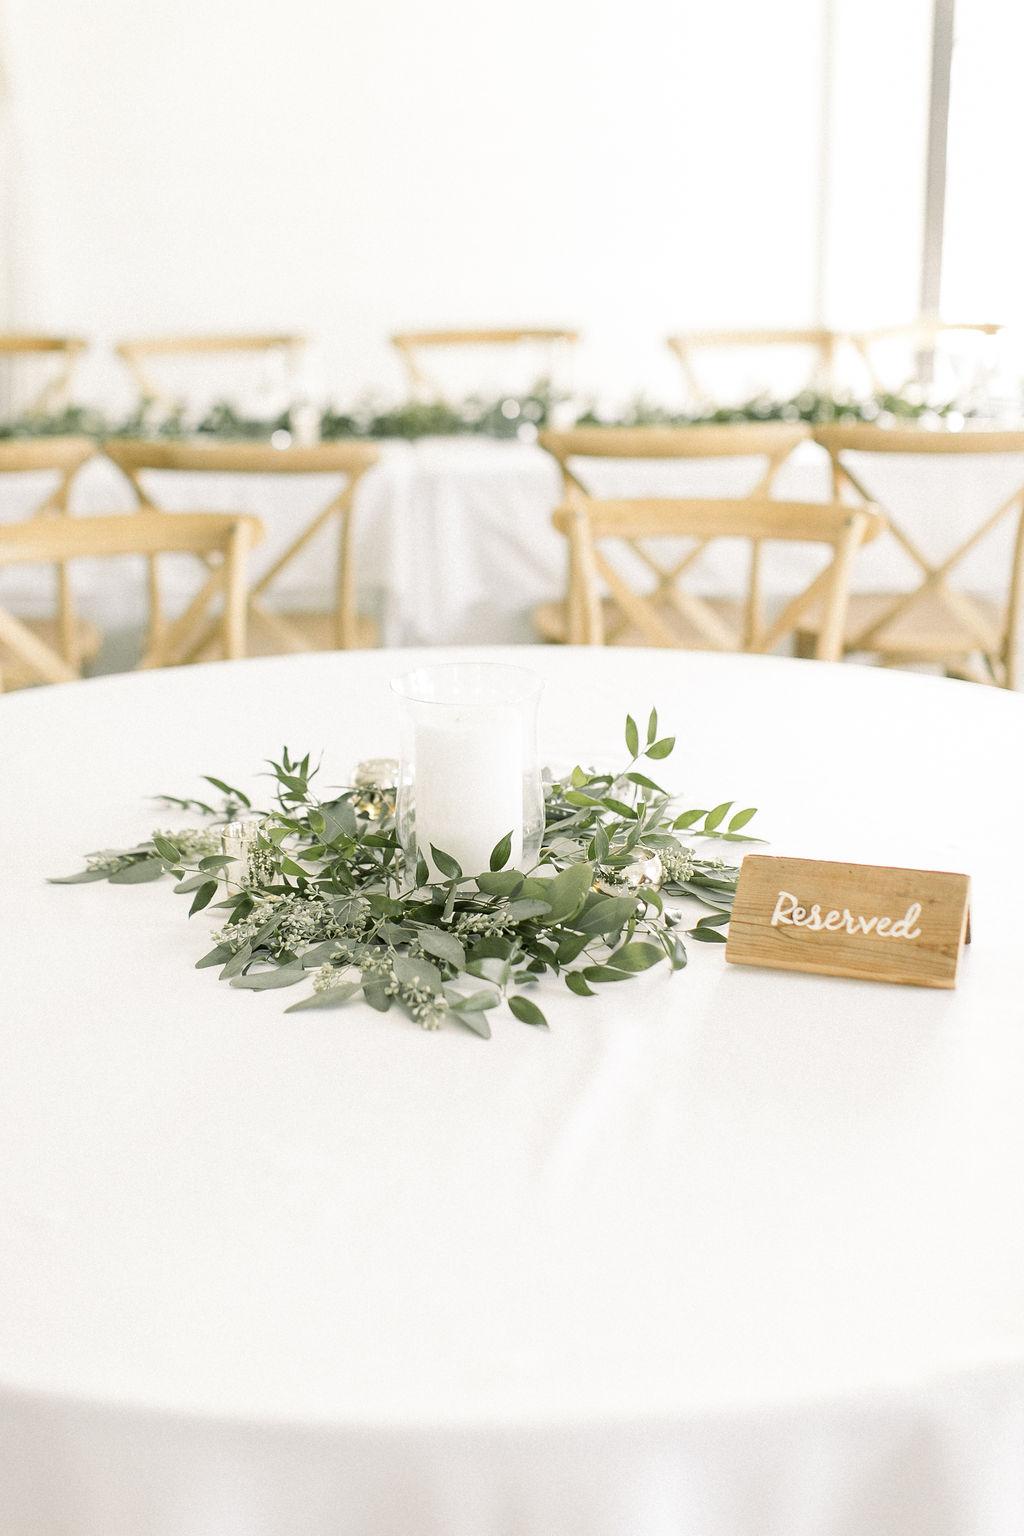 Indoor winter greenery nature-inspired wedding - 04.jpg